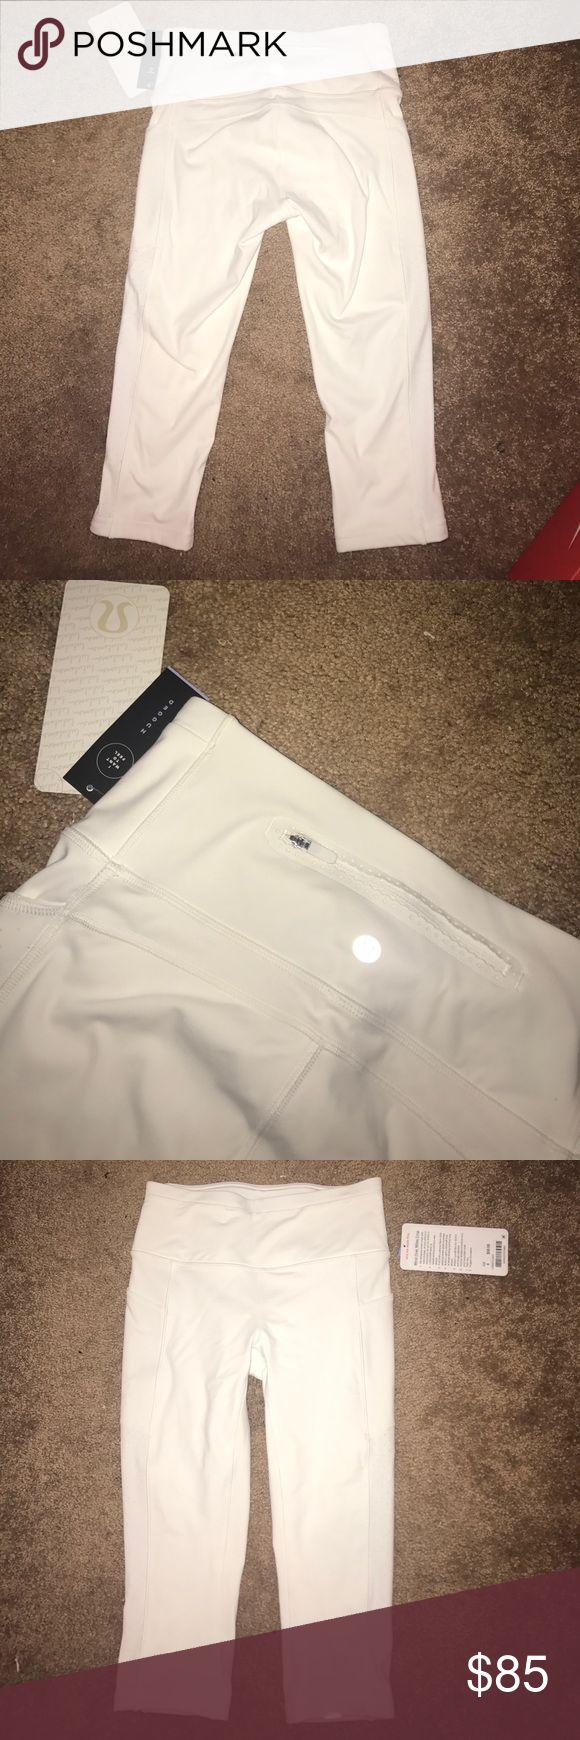 lulu lemon white capris high waisted white high waisted capri leggings with pocket on side size 4 S lululemon athletica Other